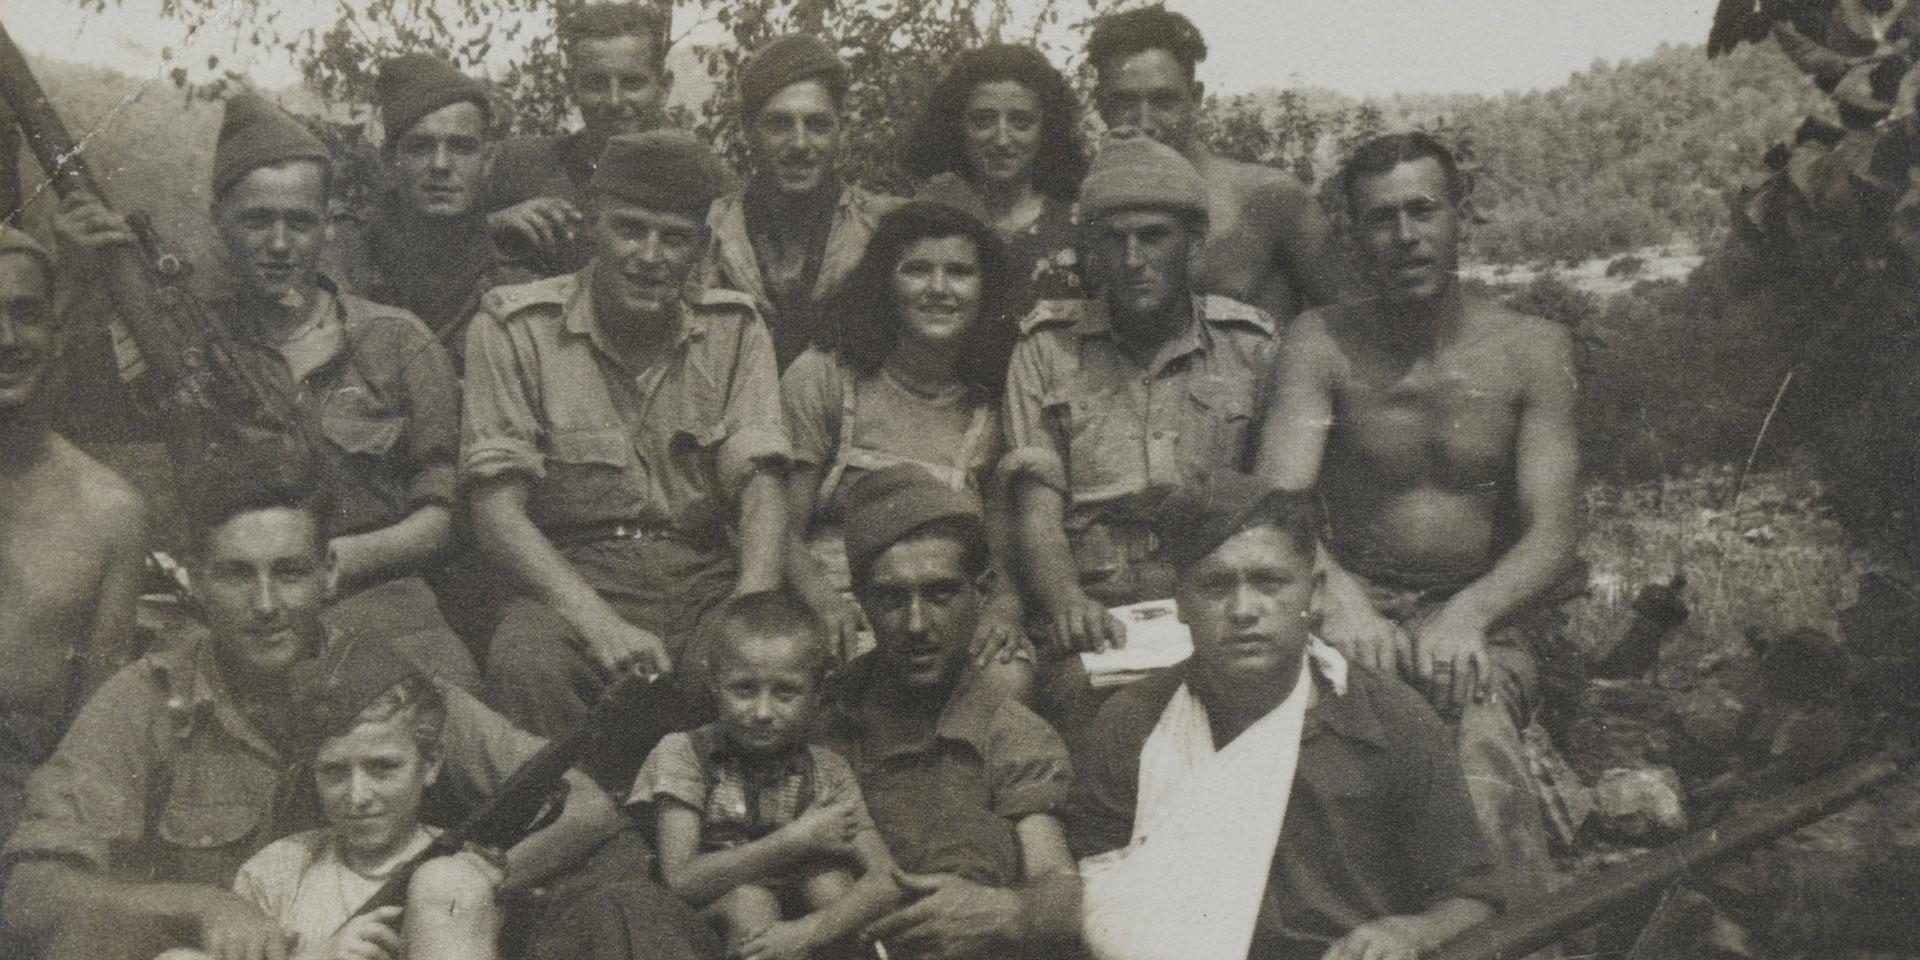 Yugoslav partisans with British commandos, Korcula, 1944